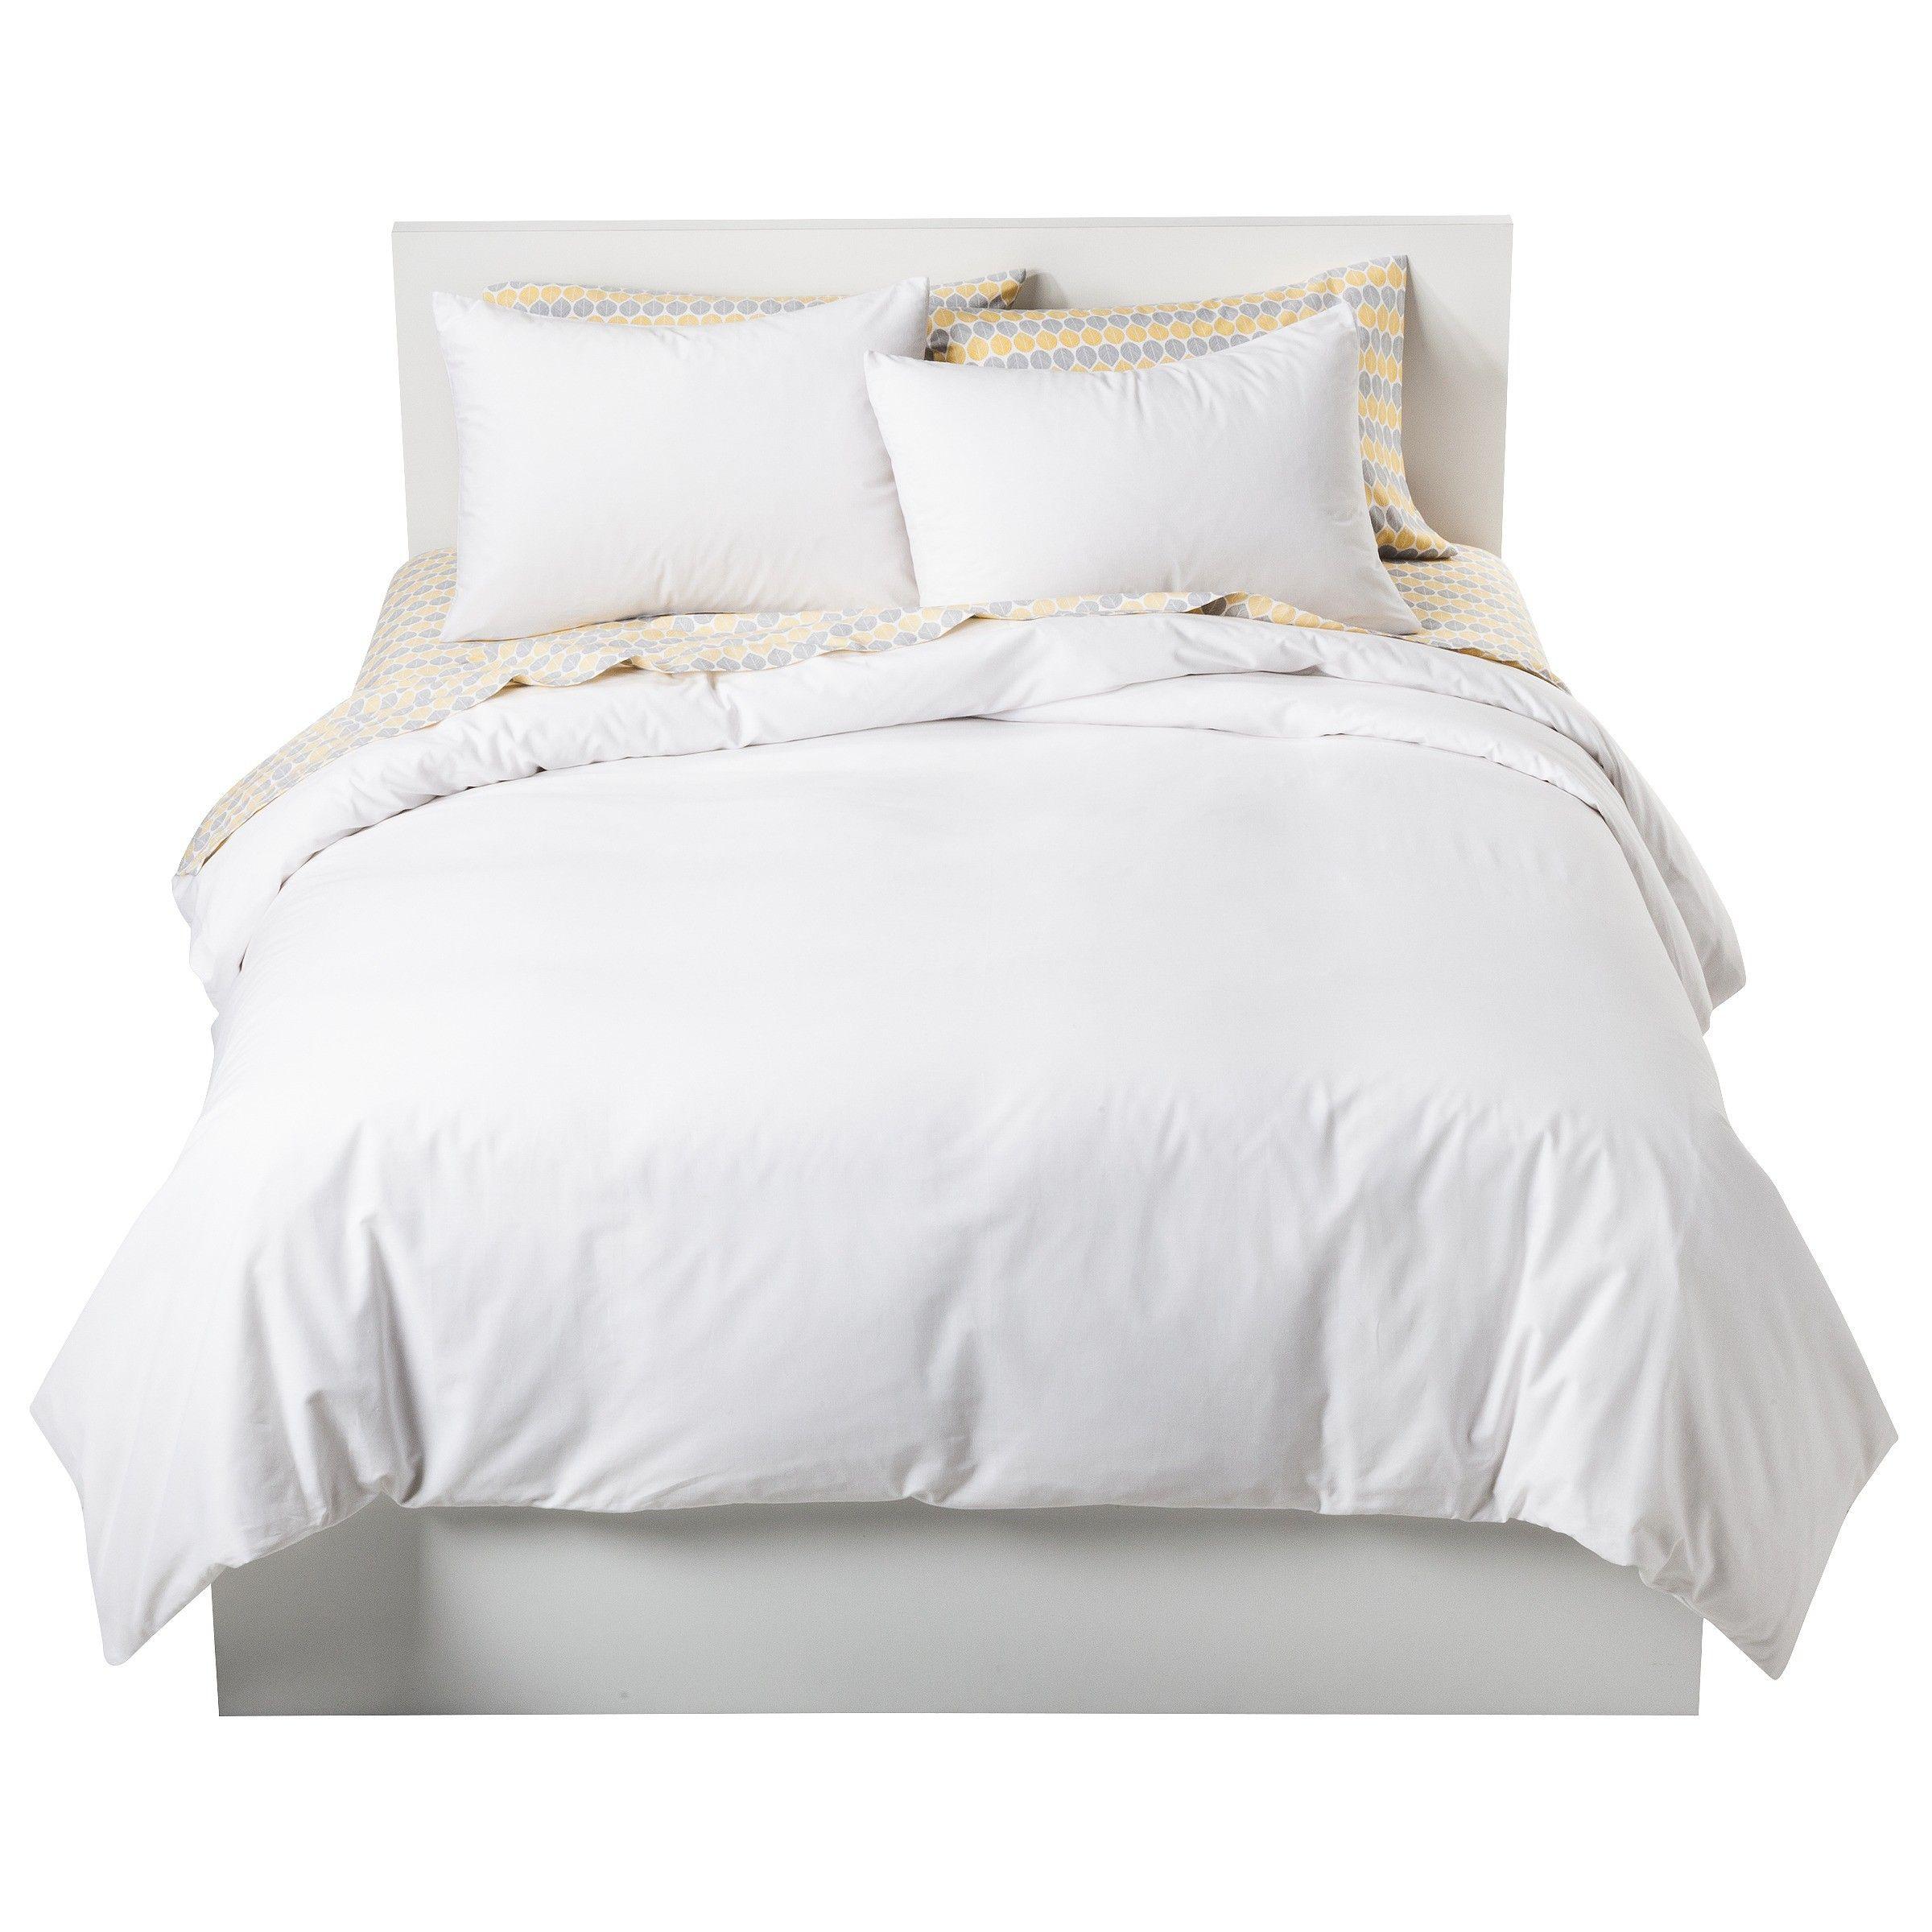 White Solid Cotton Blend Duvet Cover Set Full Queen 3pc Room